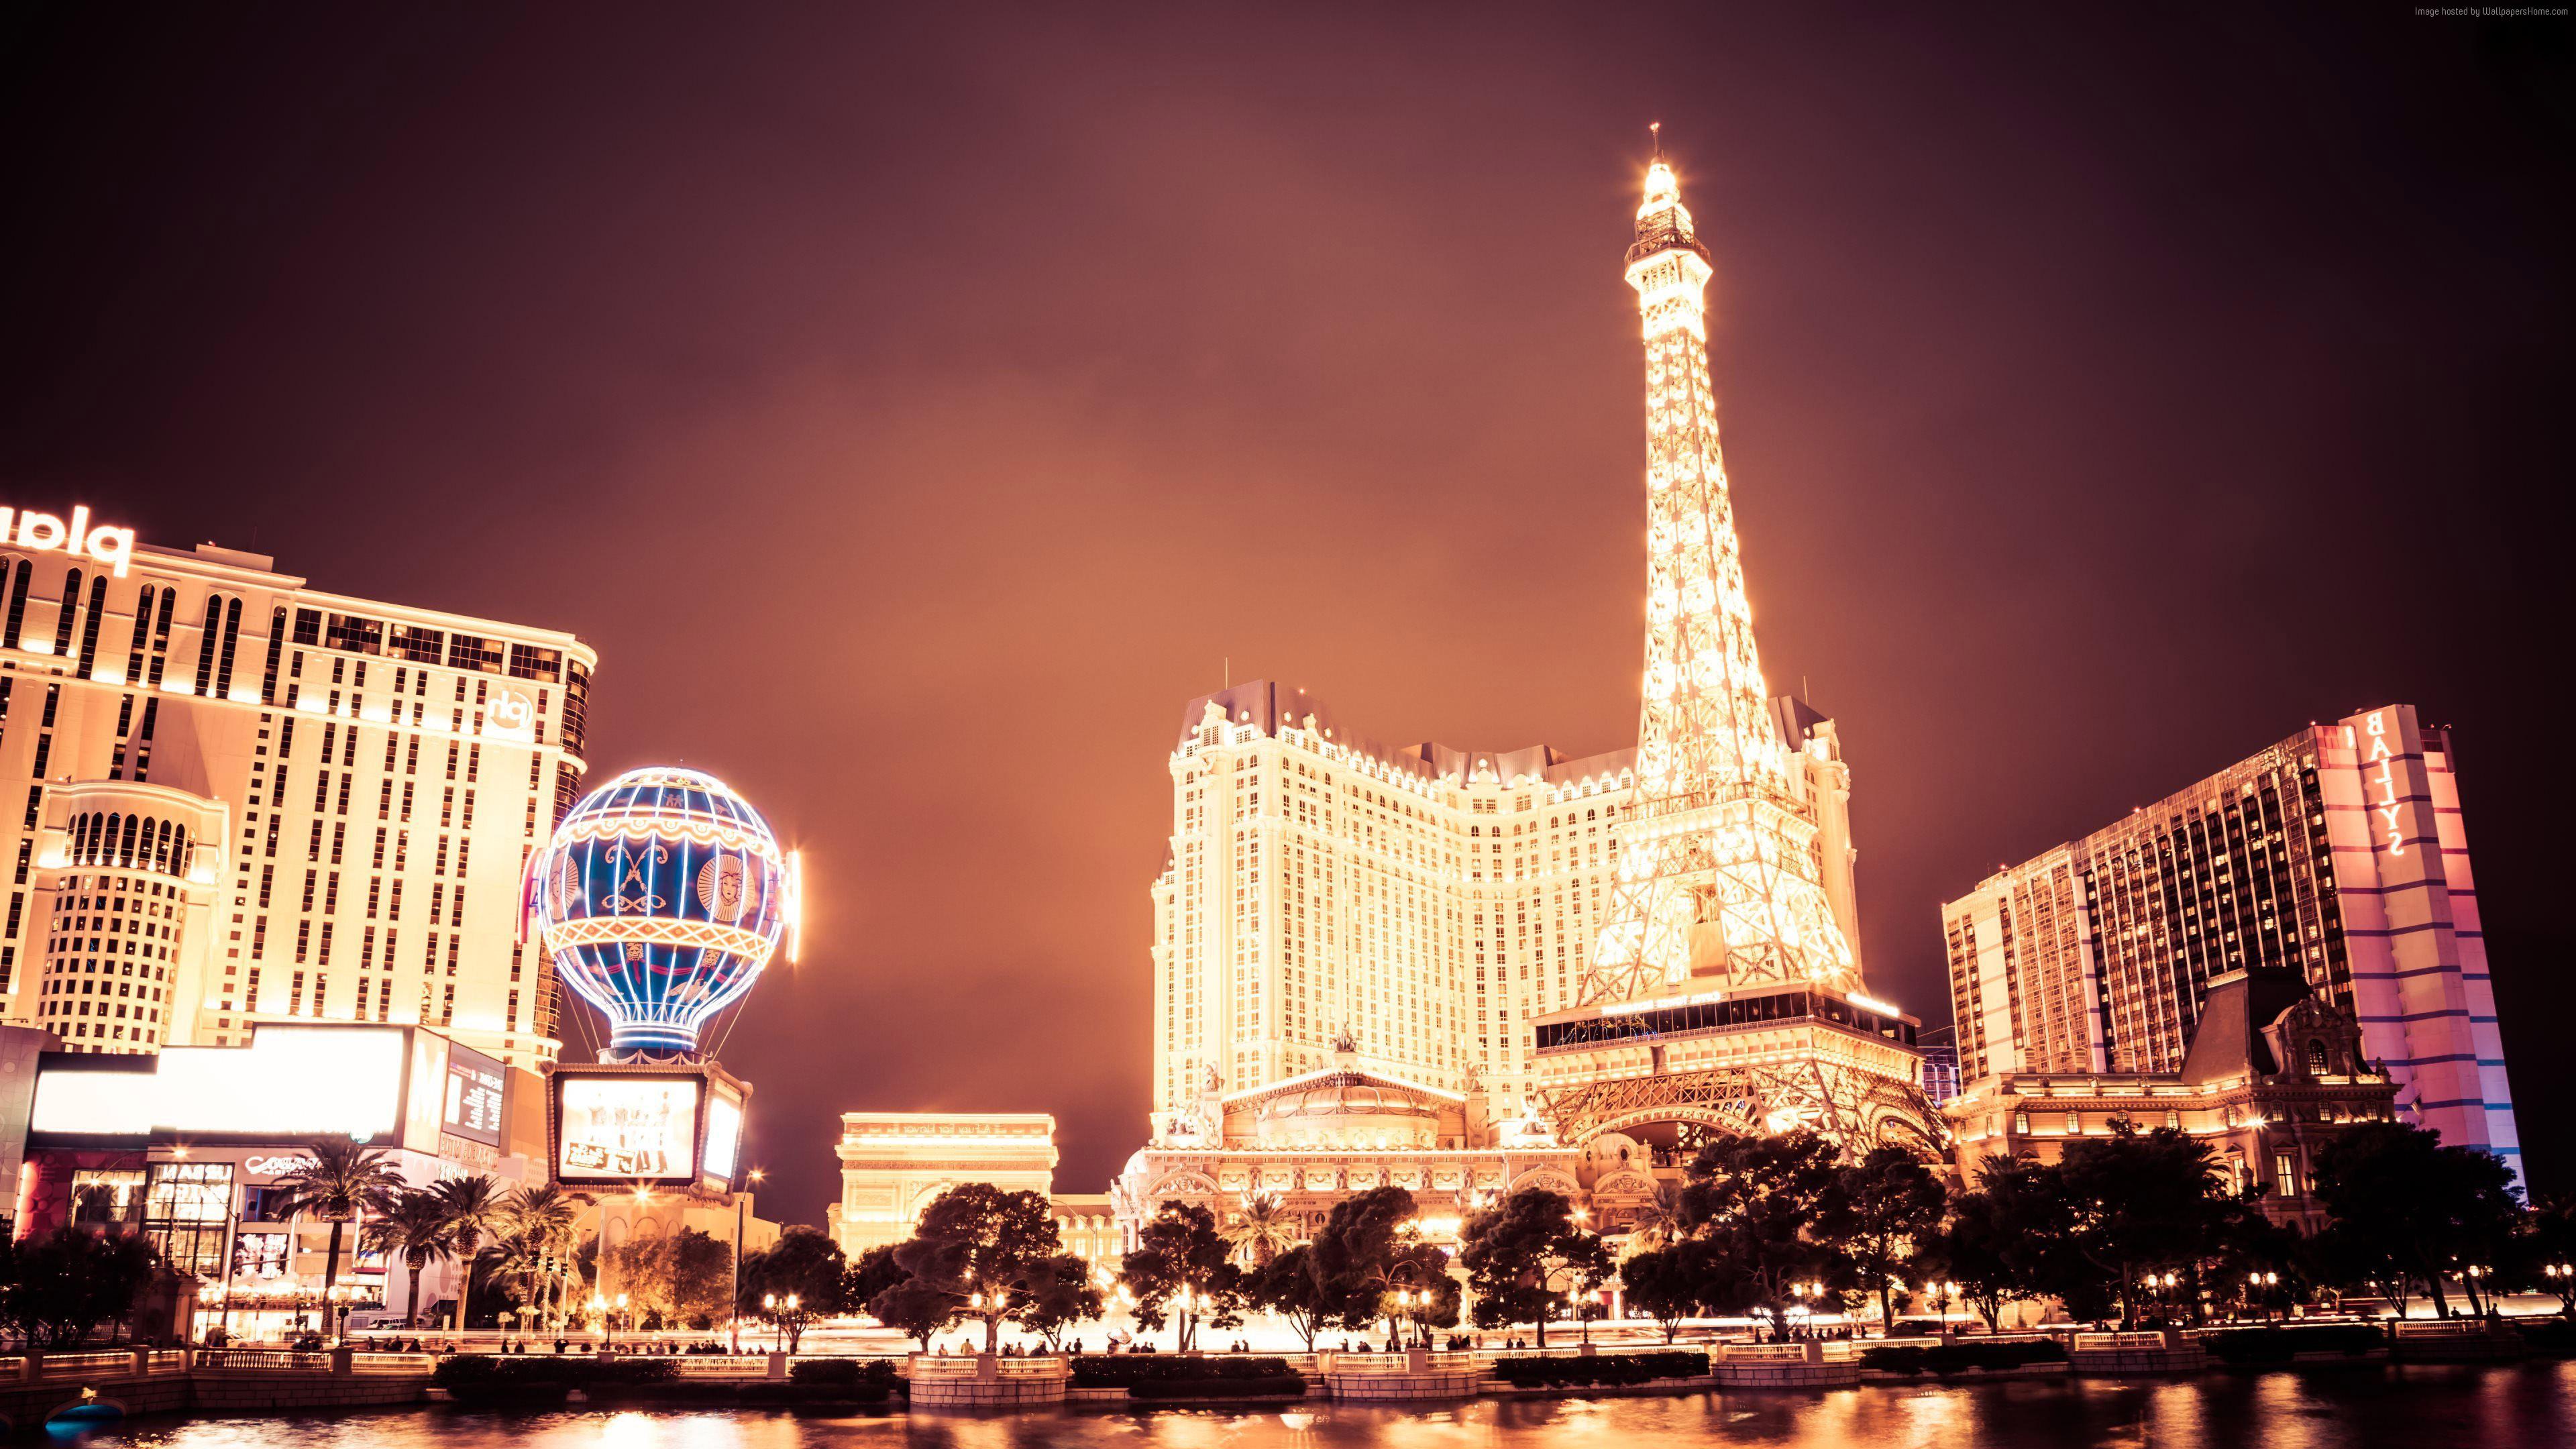 Wallpaper Las Vegas Usa Night Travel Tourism Architecture Wallpaper Download High Resolution 4k Wallpaper